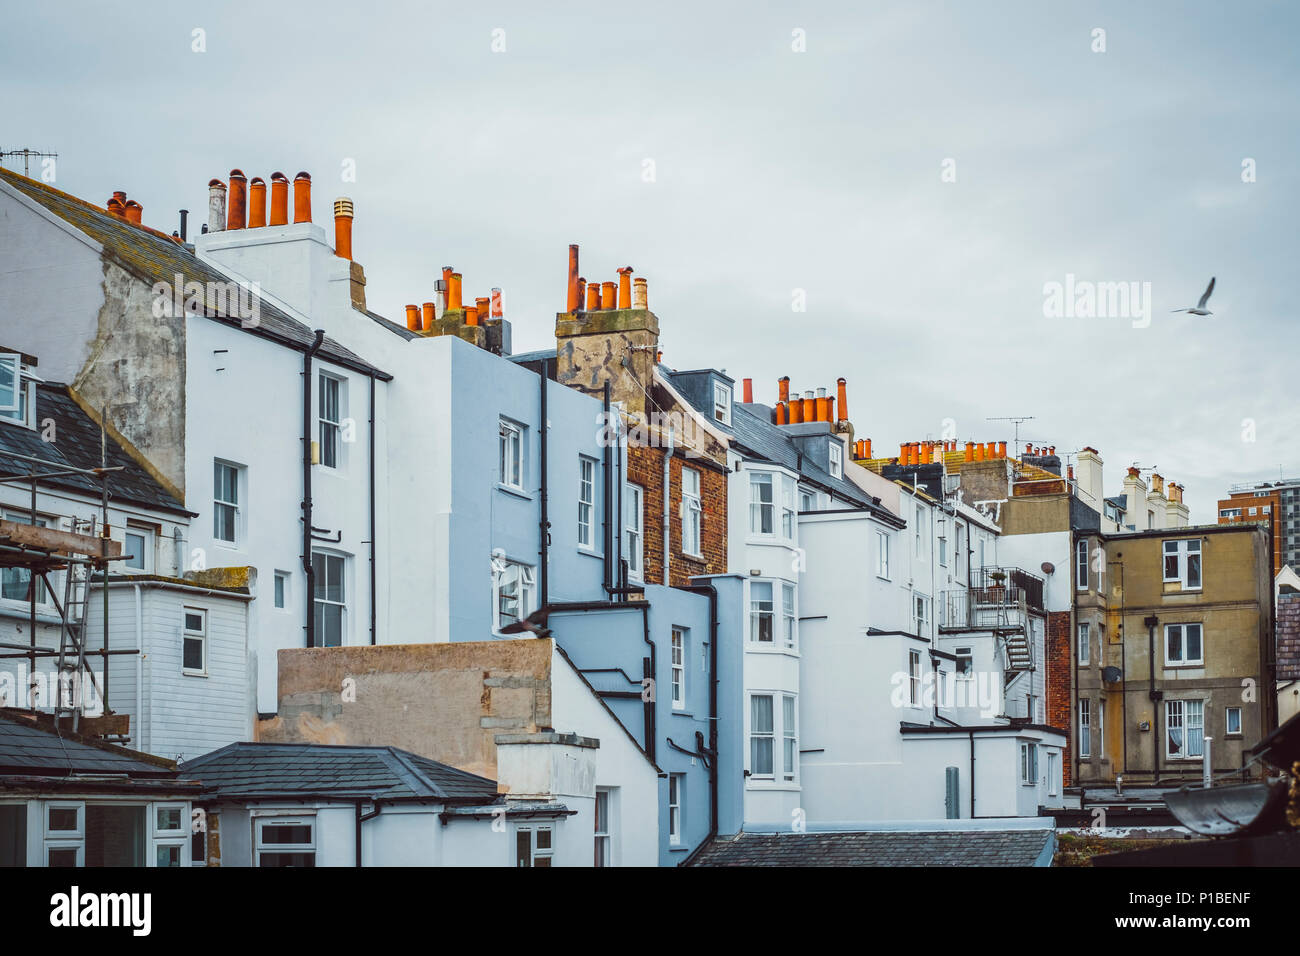 British architecture, facades, chimneys, Brighton, England - Stock Image